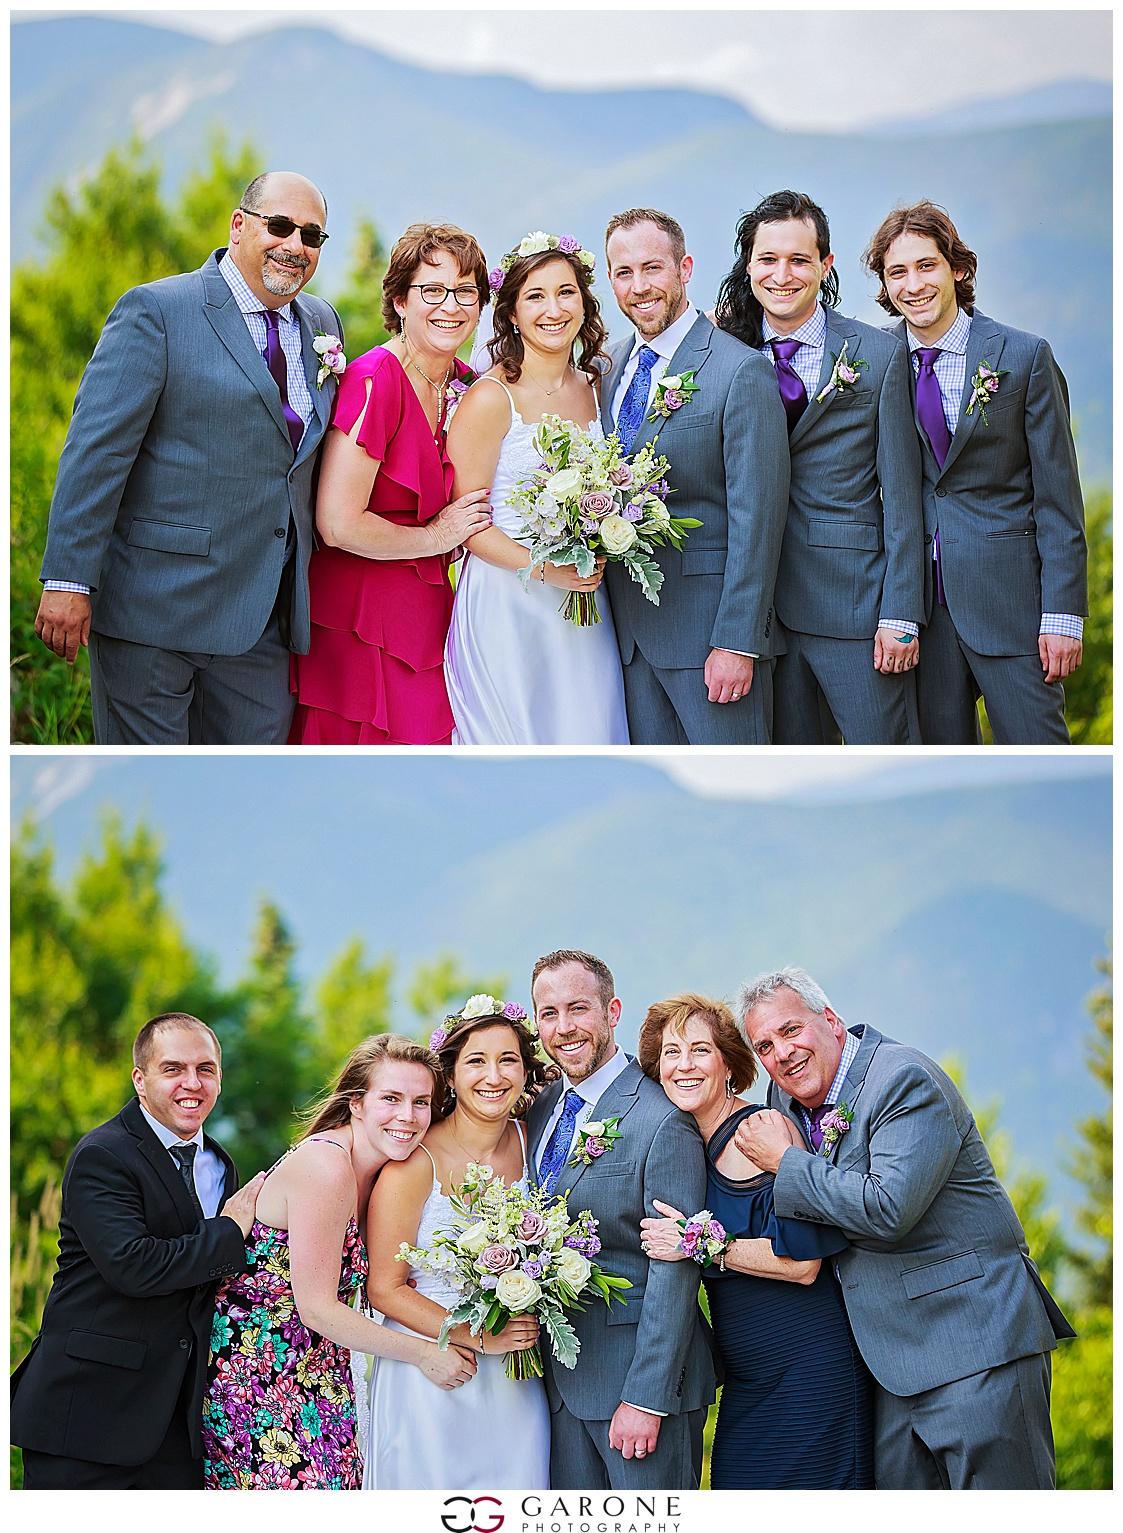 Natalie_Eric_Loon_Wedding_White_Mountain_Wedding_Photography_Garone_Photography_0022.jpg